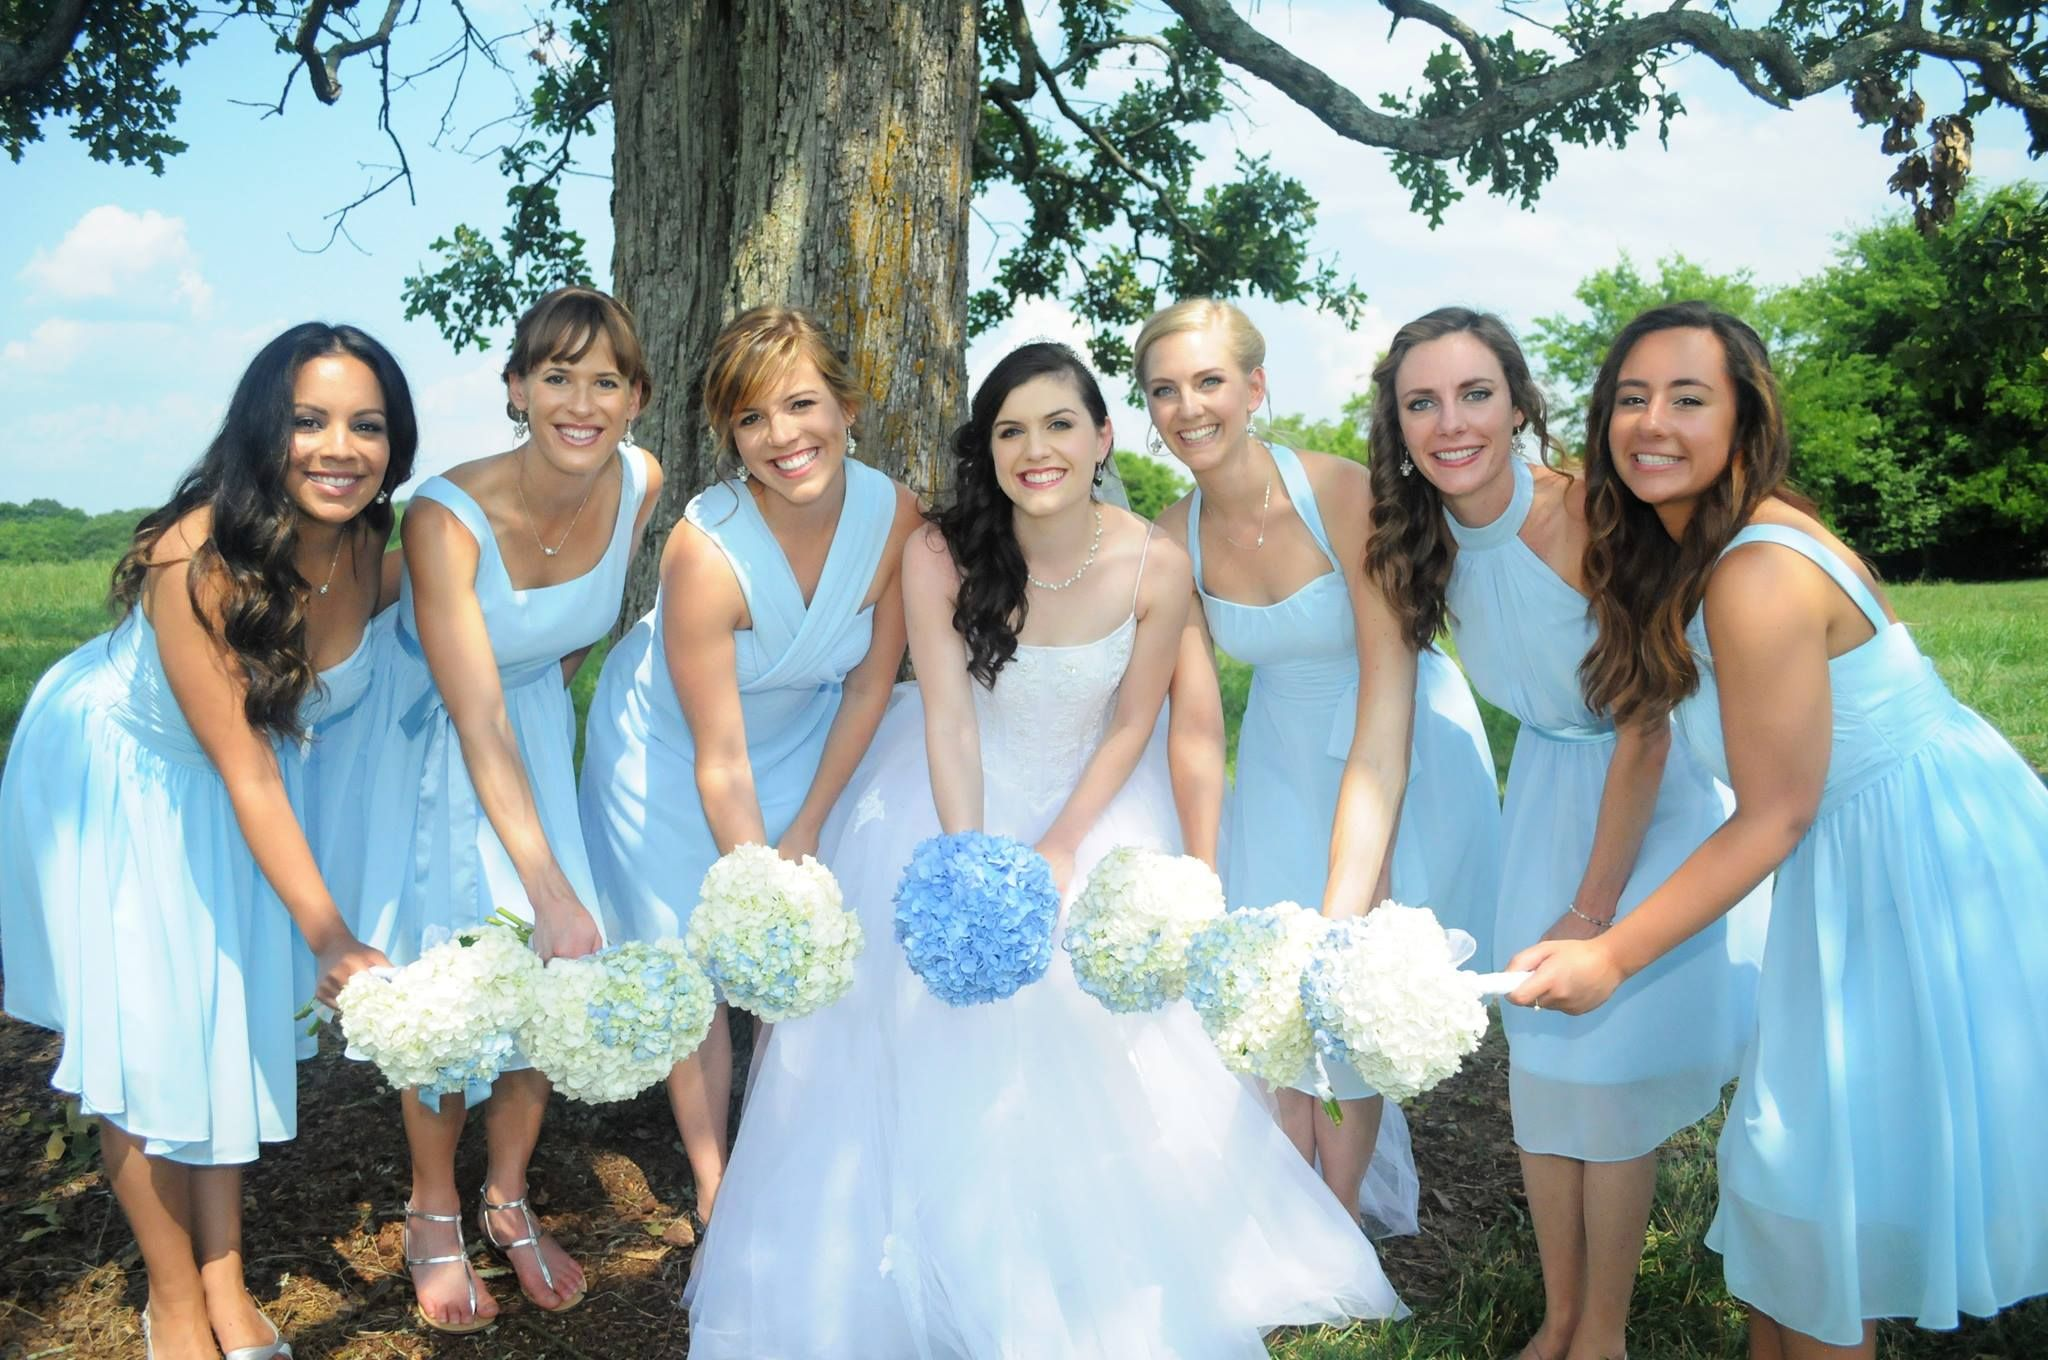 Carolina Blue Bridesmaid Dresses 3ClNj9k6 | Sarah\'s Bridesmaid Dress ...